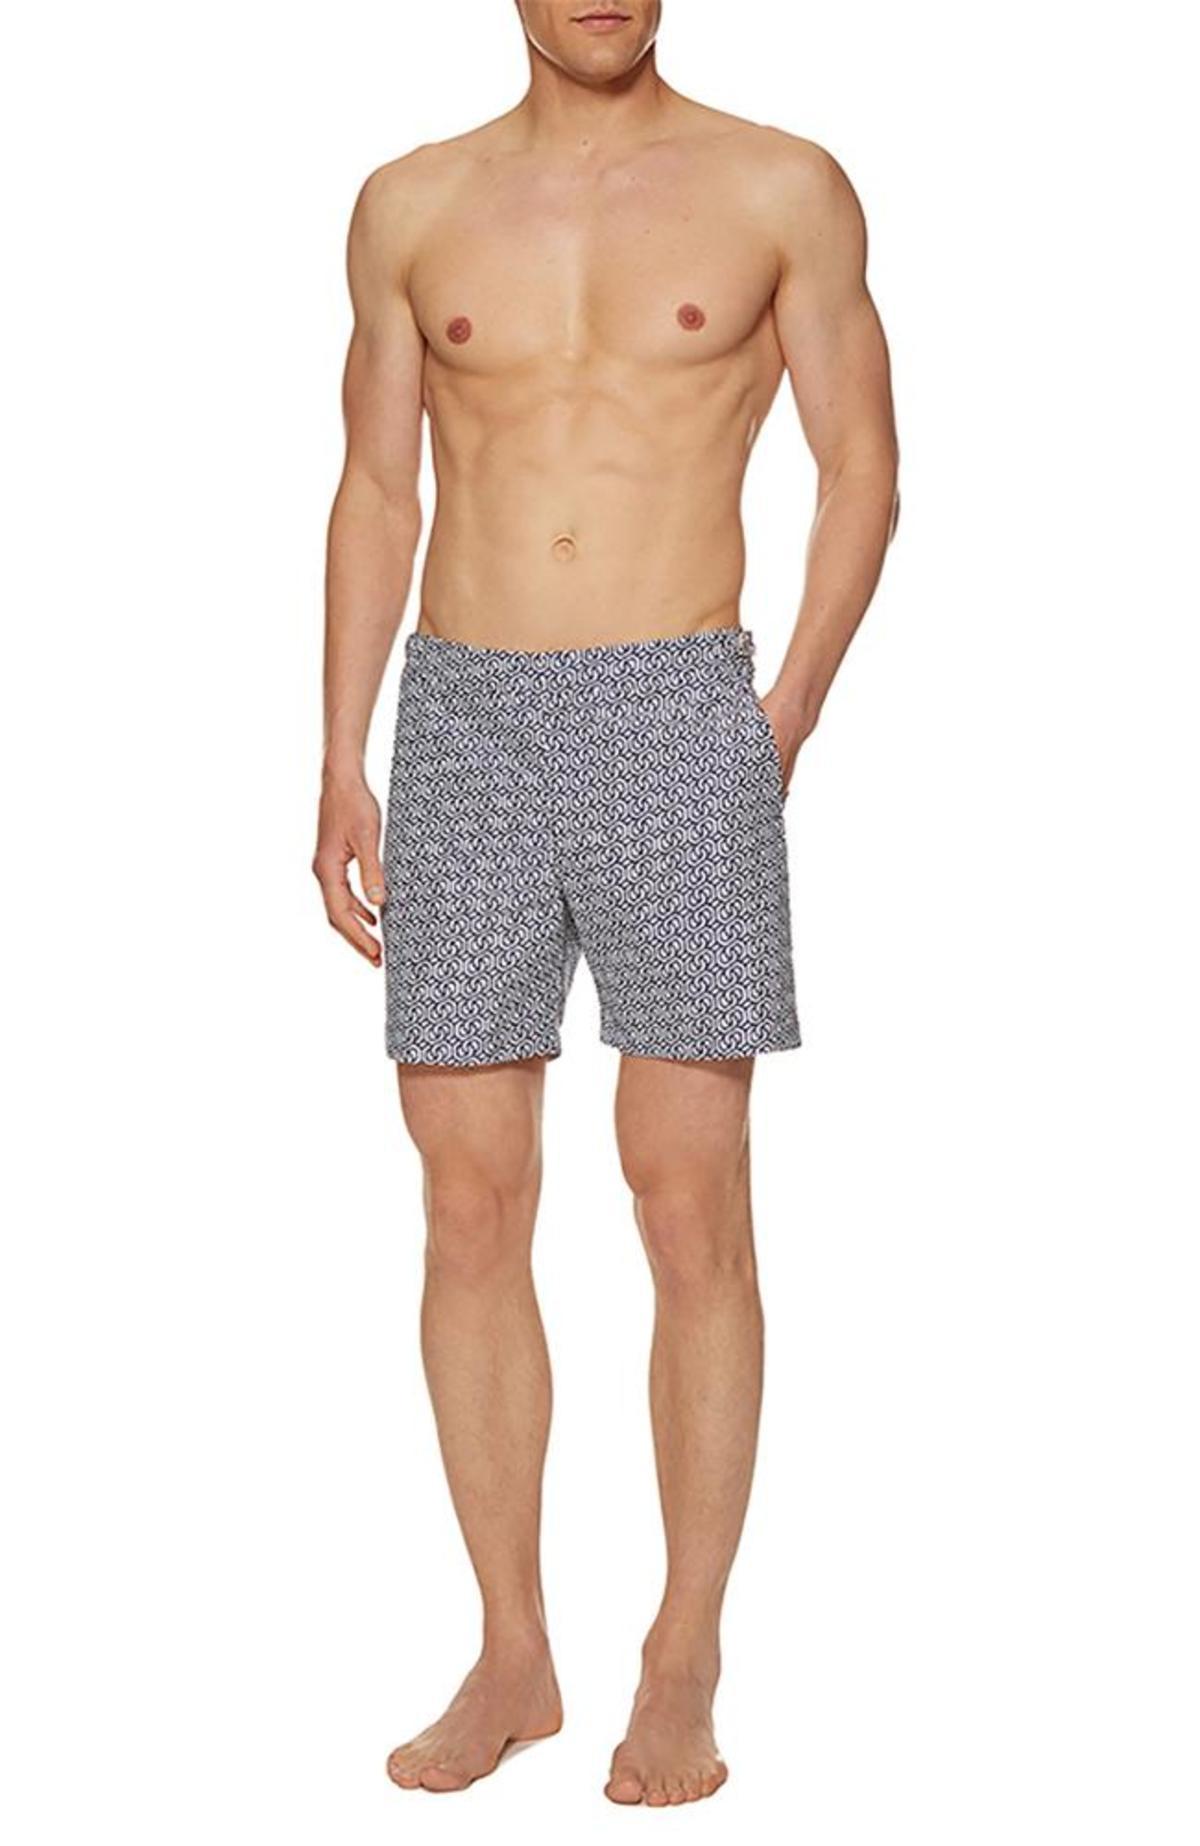 211681b87 Orlebar Brown Bulldog Swim Shorts - Navy Chain Print